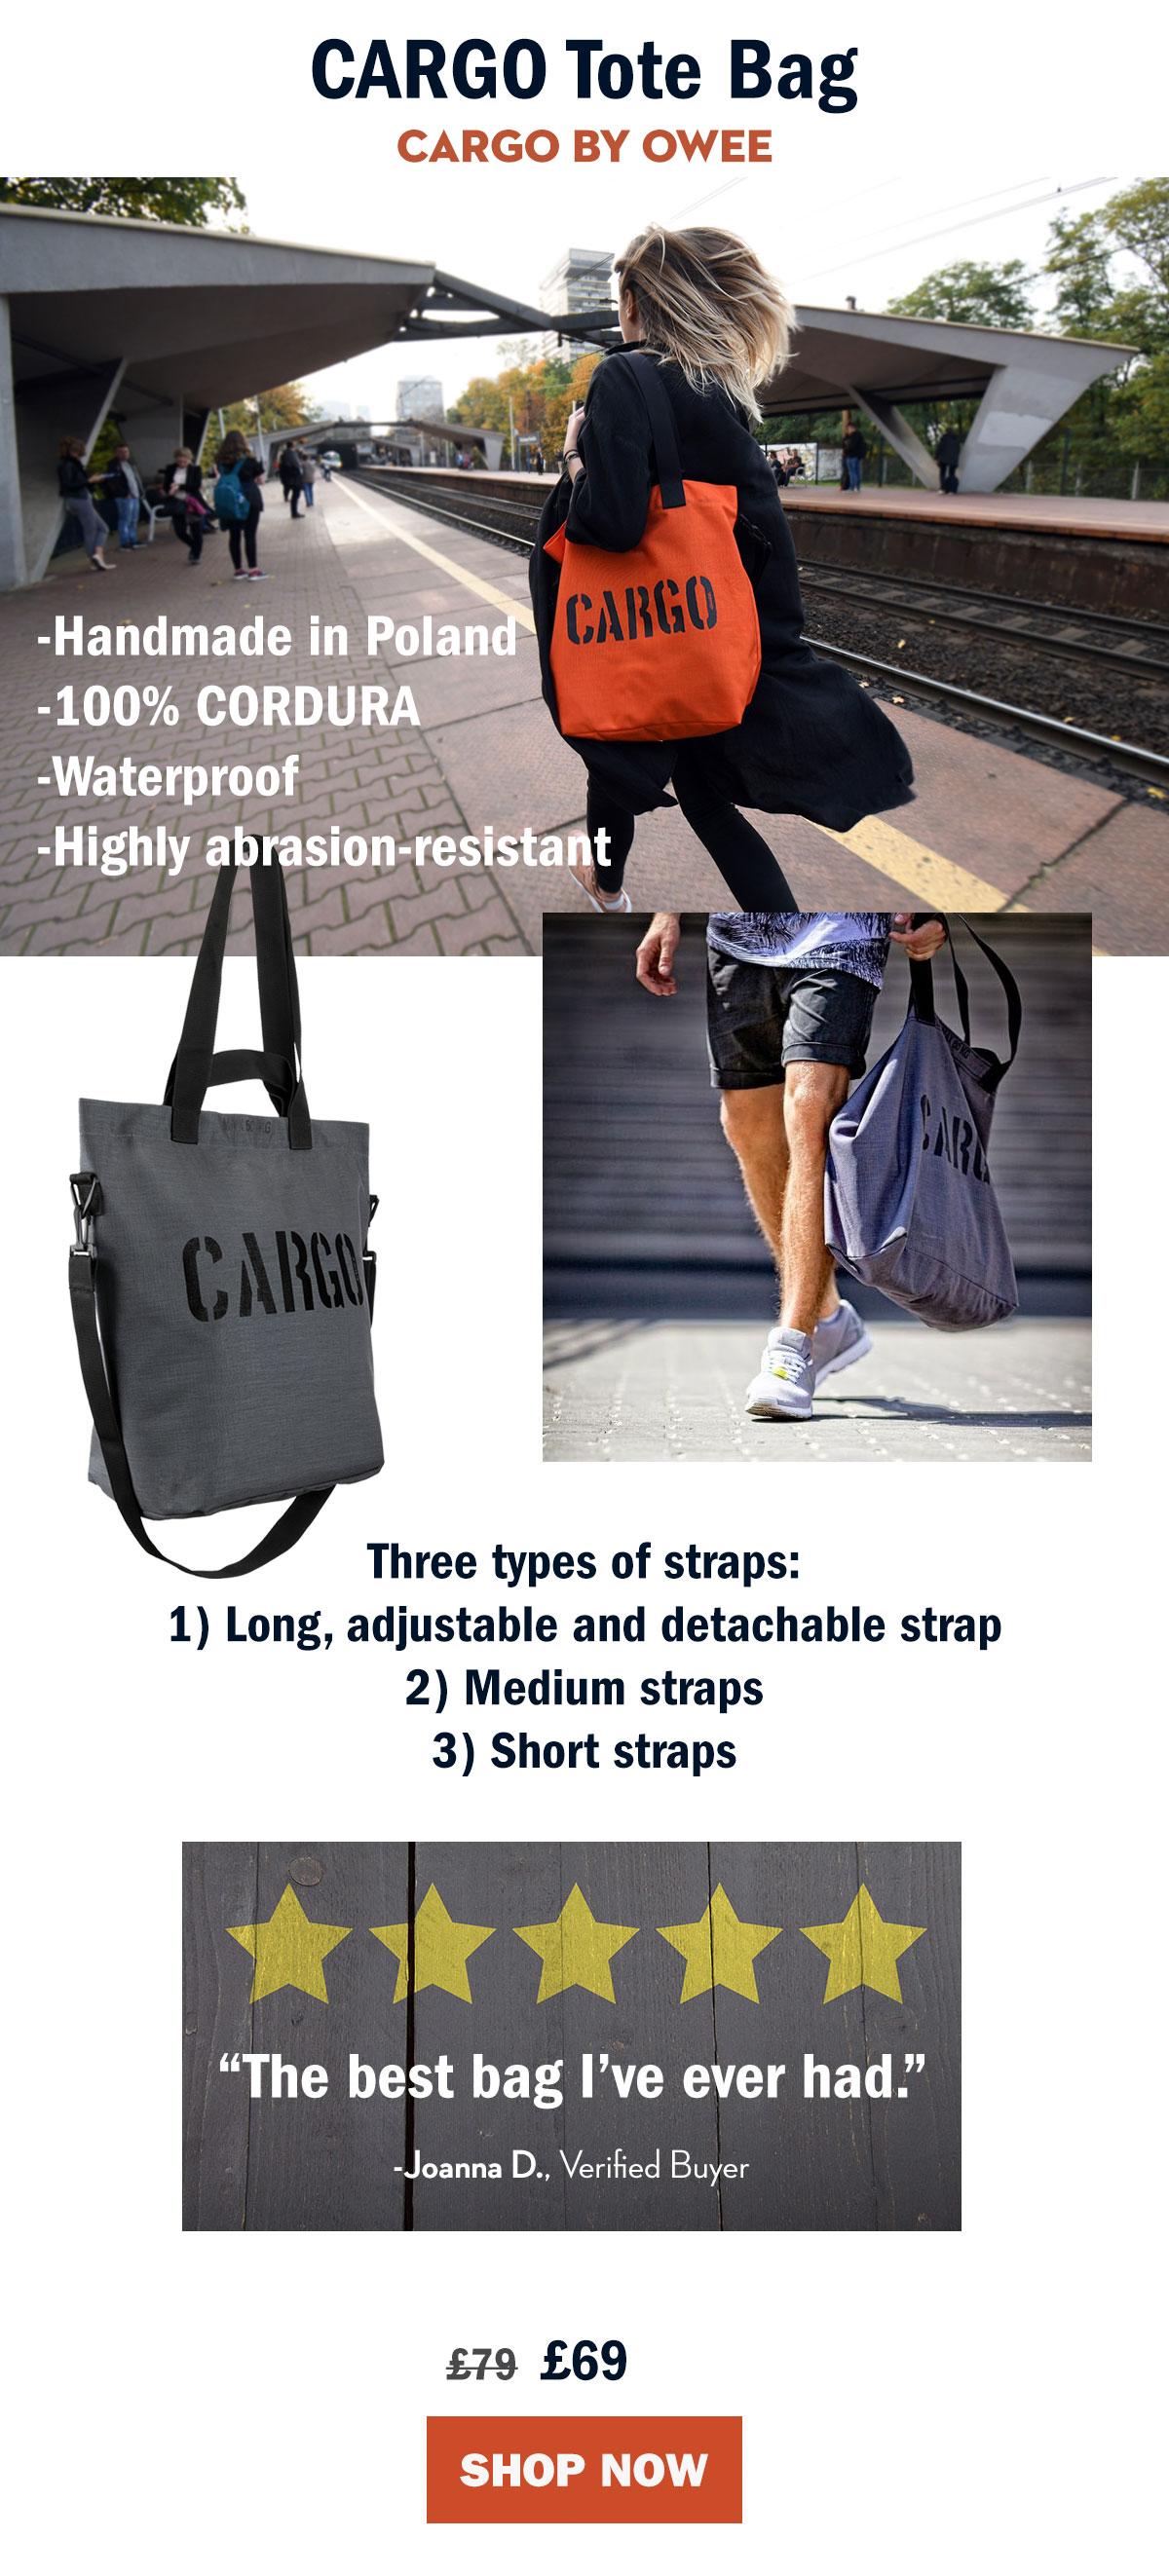 Cargo Tote Bag